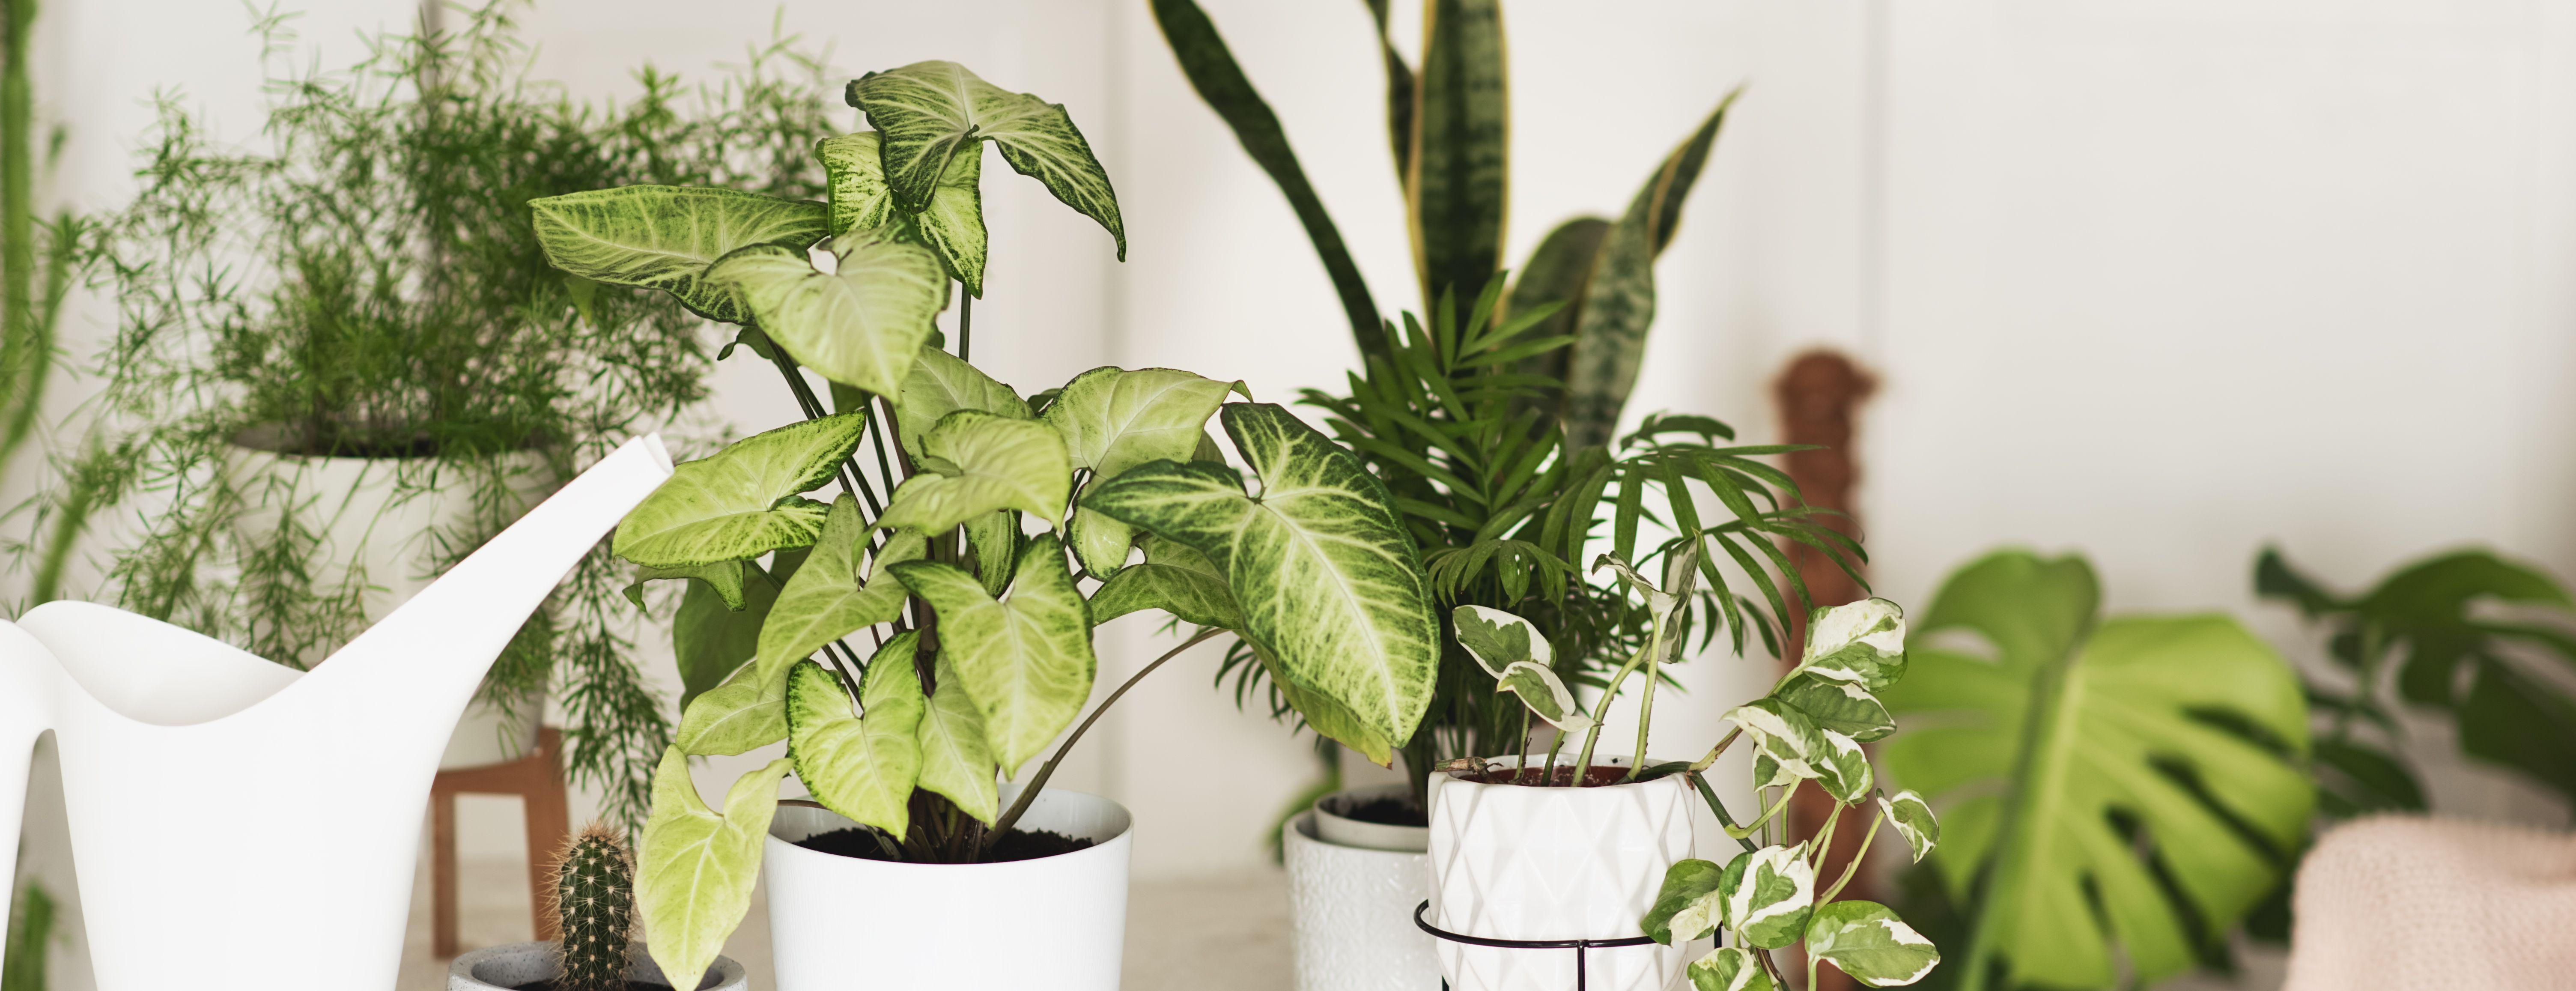 Gardening pro James Wong reveals impressive DIY indoor water feature using an IKEA table